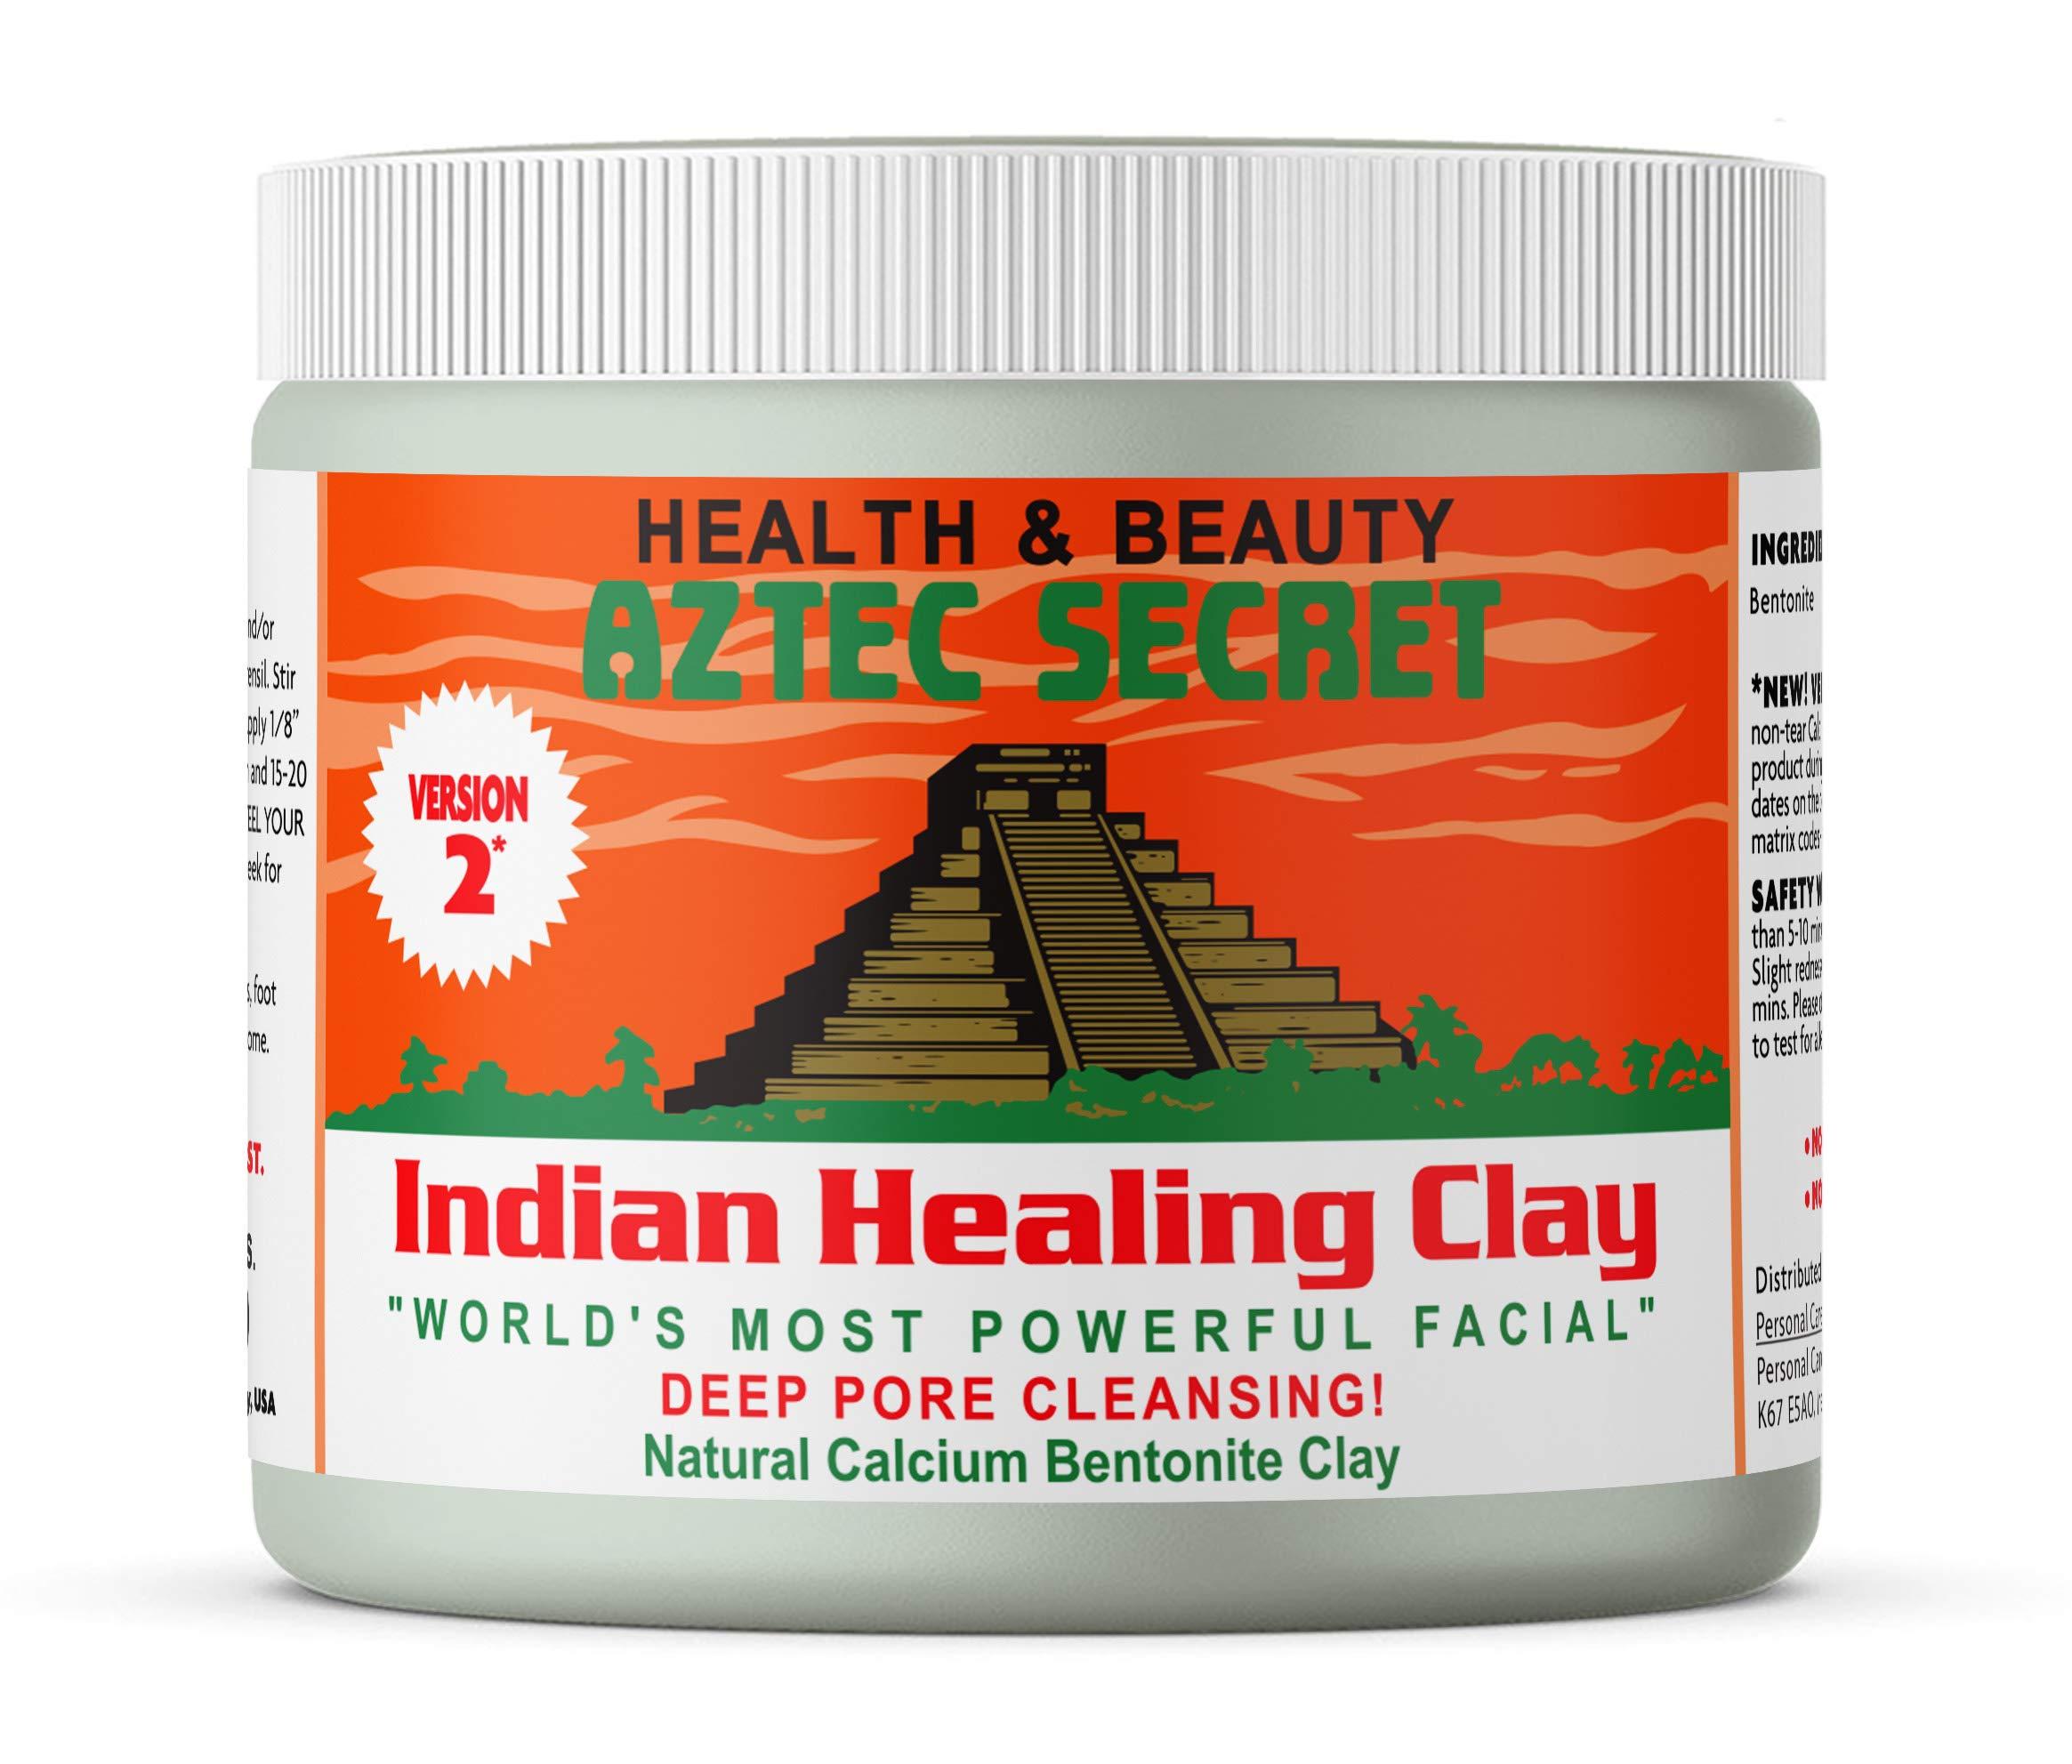 Aztec Secret - Indian Healing Clay 1 lb. (450 Grams) - Deep Pore Cleansing Facial & Body Mask - The Original 100% Natural Calcium Bentonite Clay - New Version 2